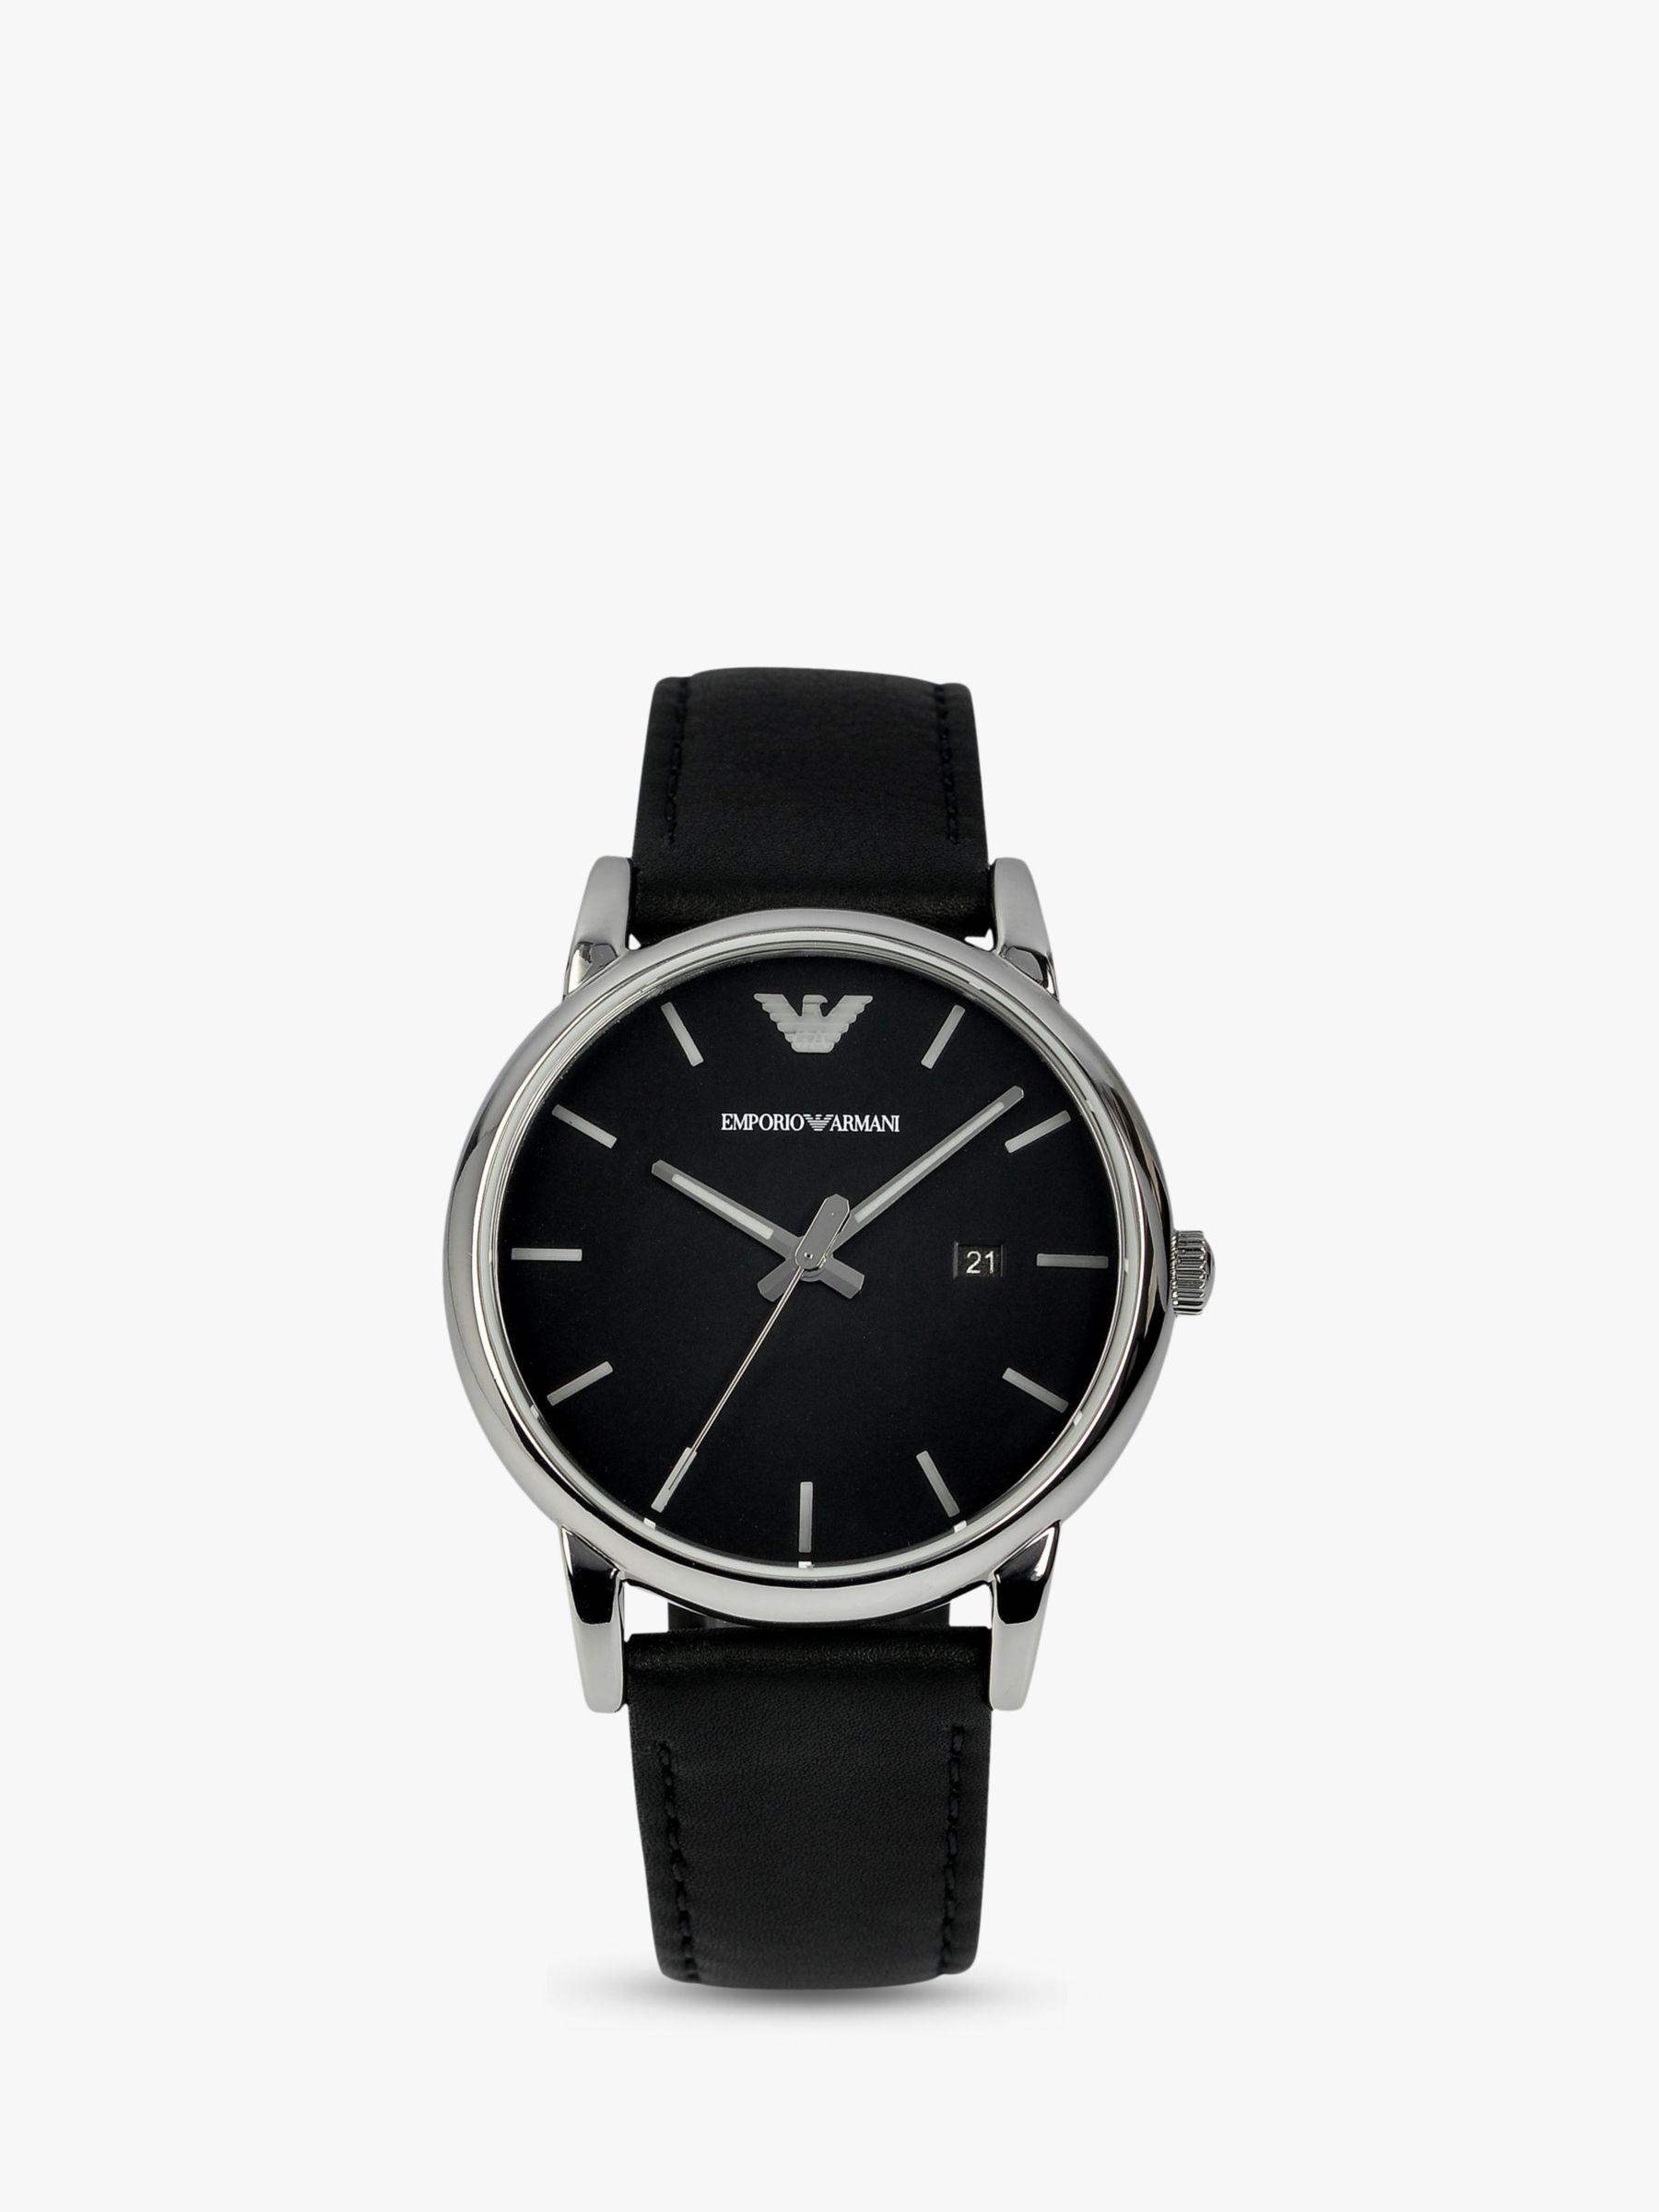 4ac597a061 Emporio Armani AR1692 Men's Leather Strap Watch, Black